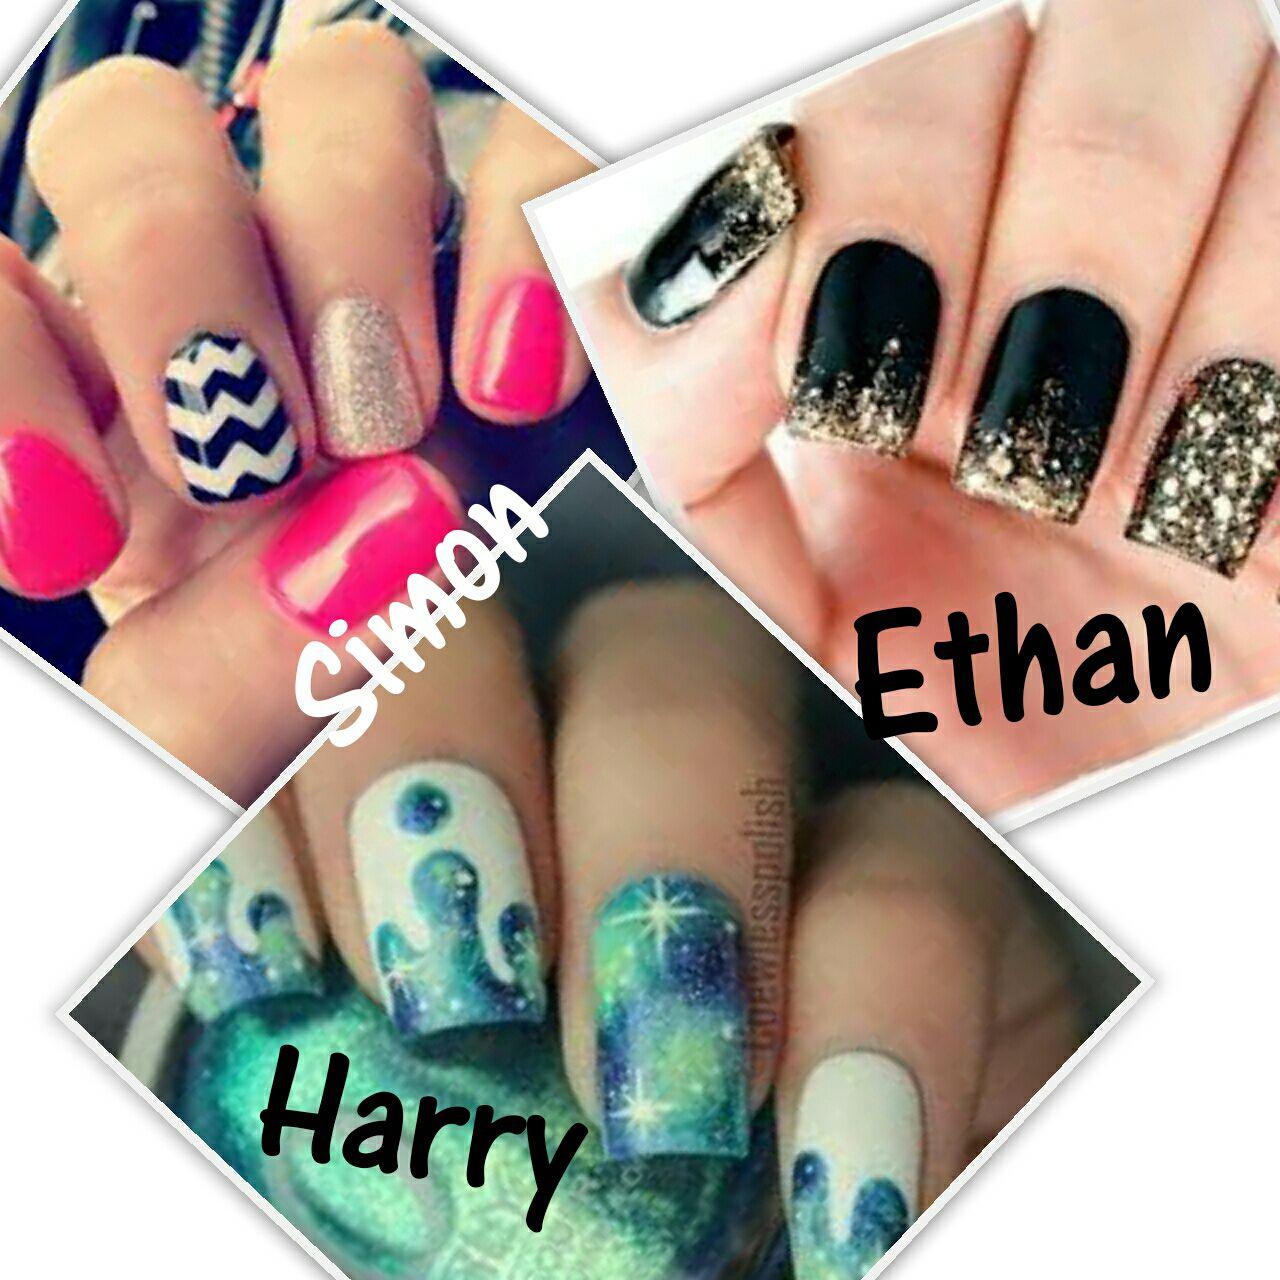 Sidemen Preferences - Your nails part 2 - Wattpad